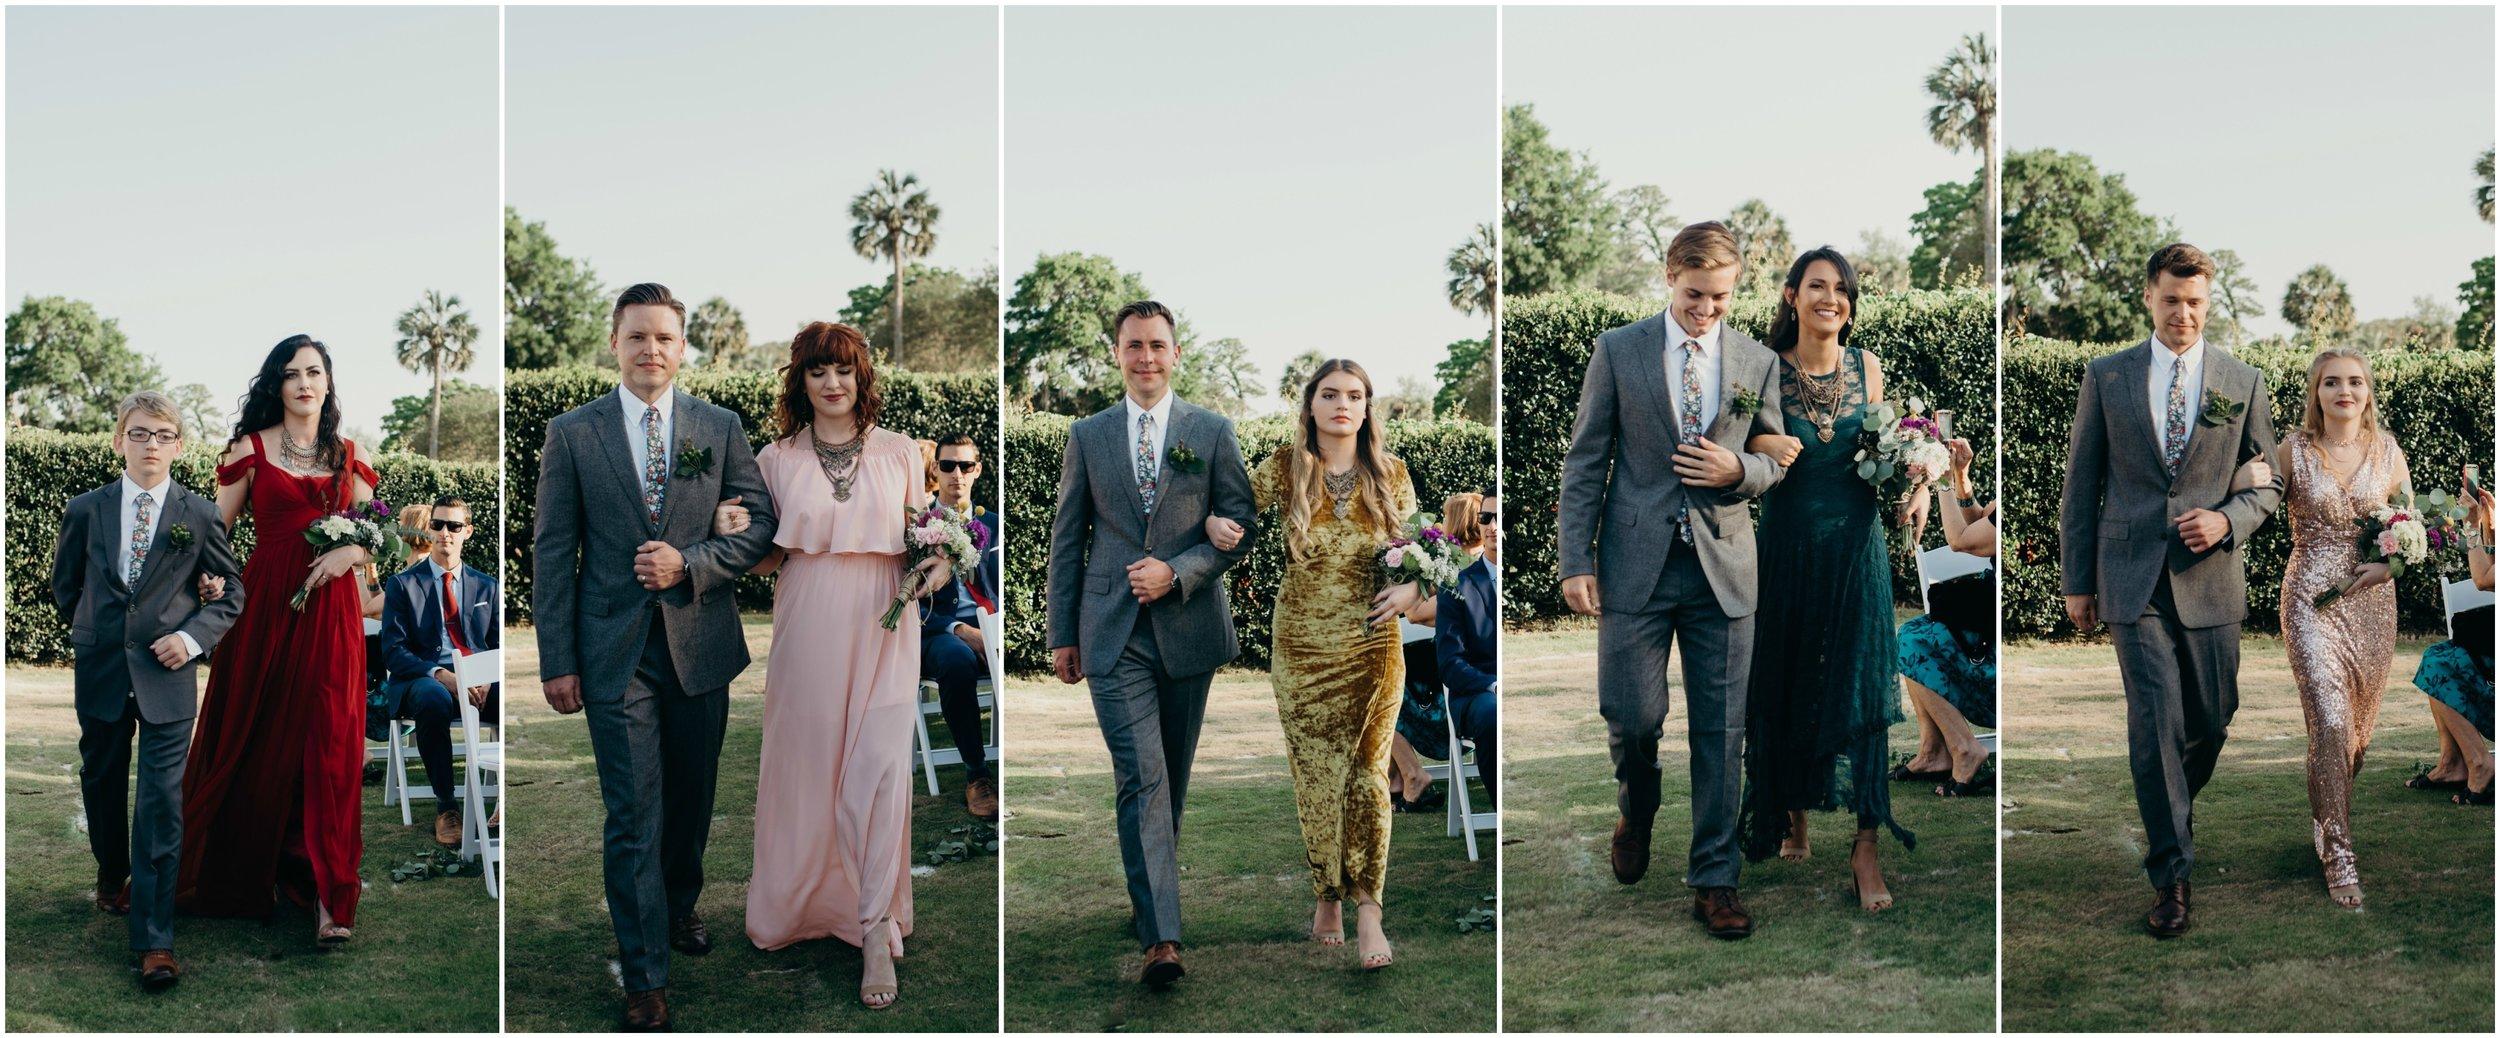 zayda-collin-wedding-bridal-party-ceremony.jpg